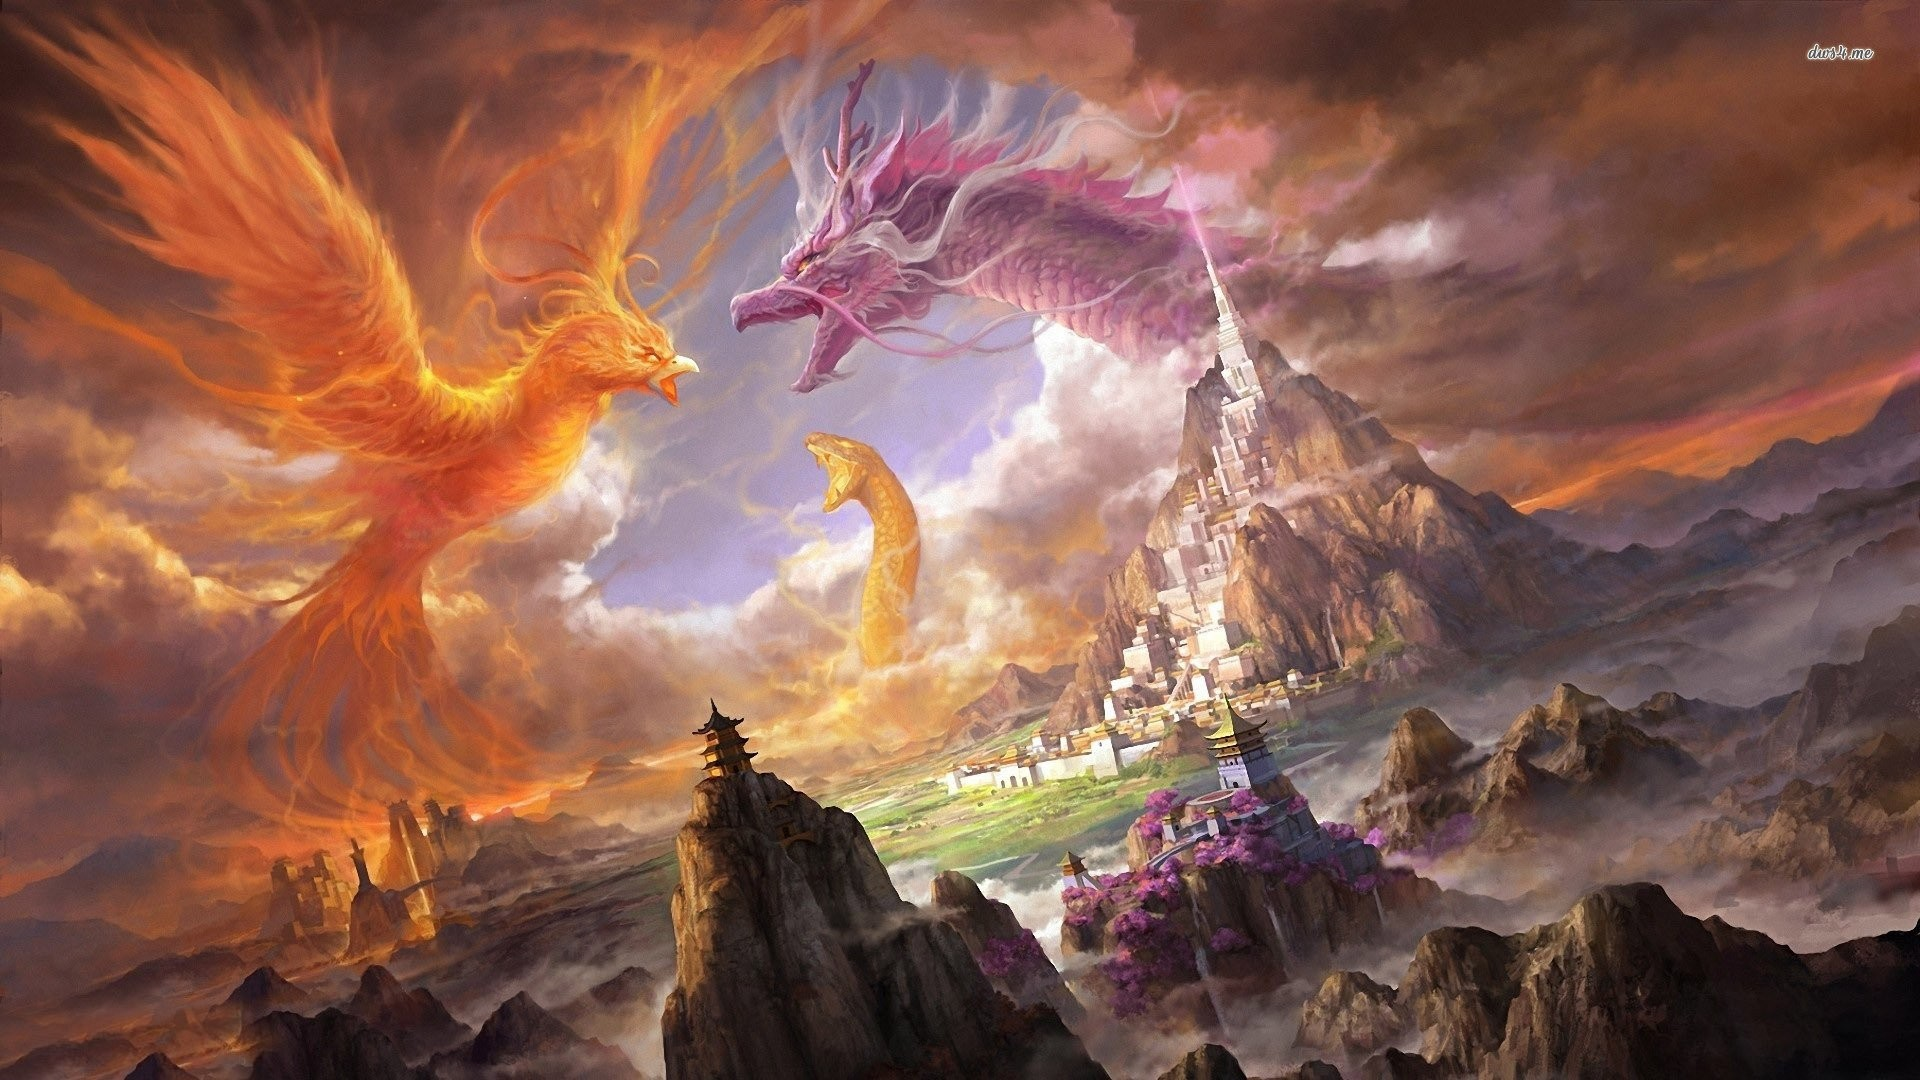 The Legend Of Spyro Wallpaper